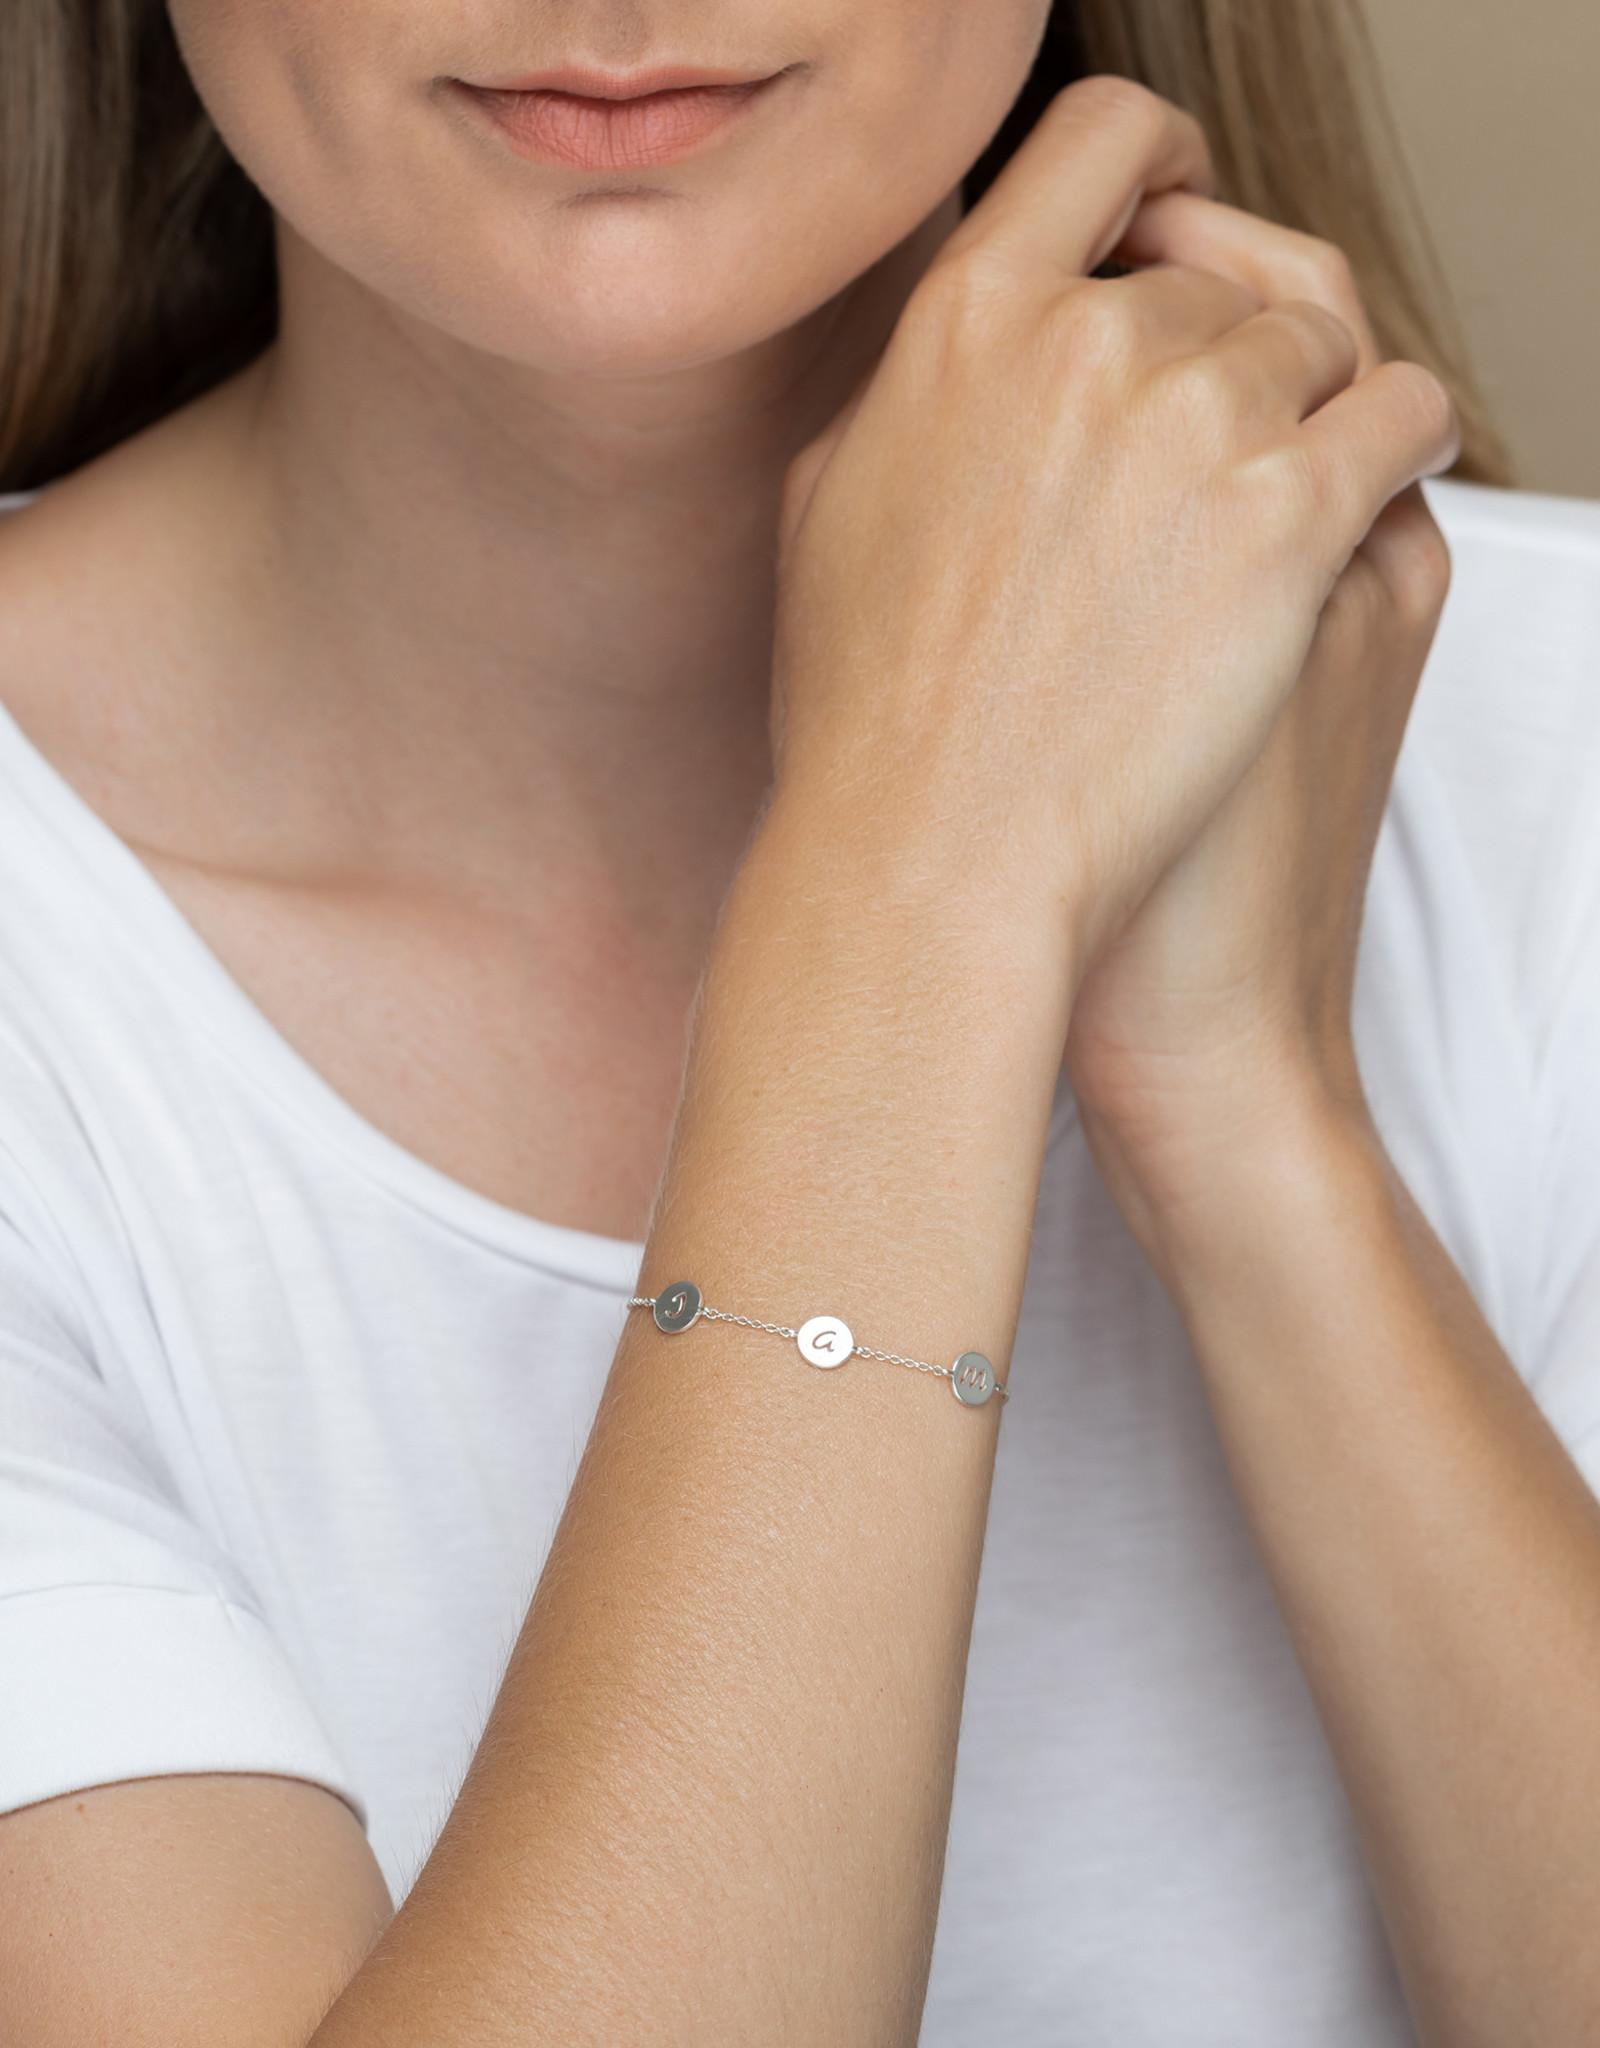 Ontwerp je armband met 3 bedels